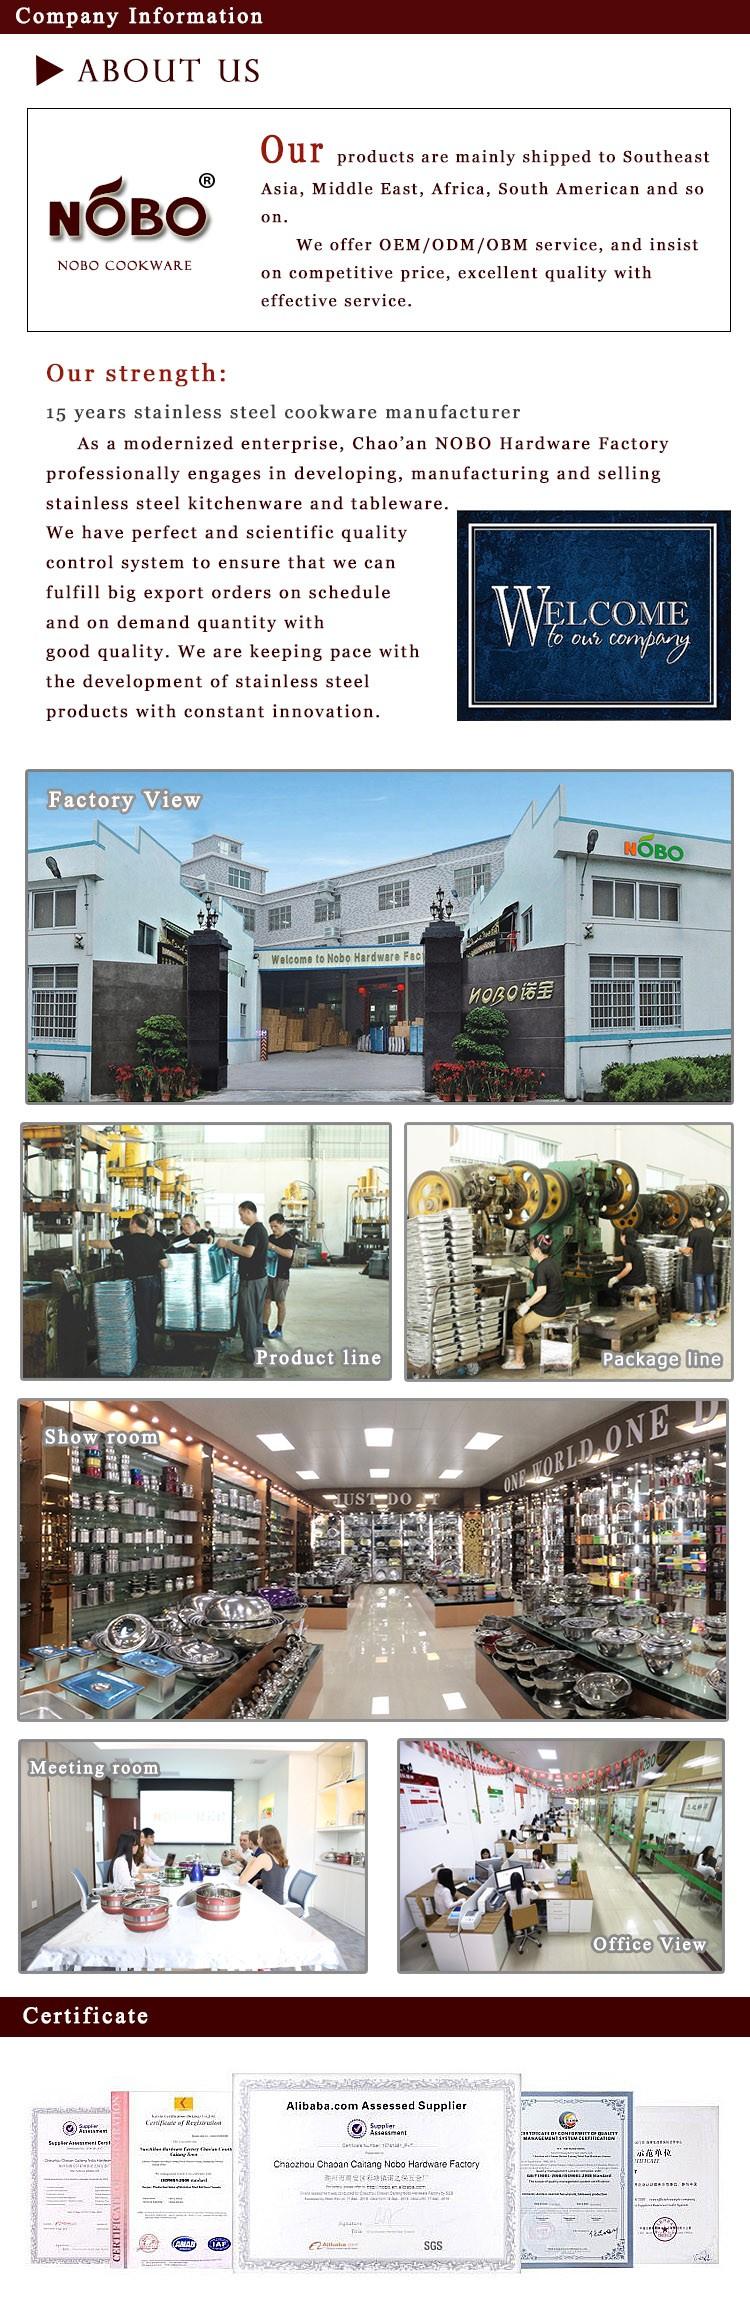 new company info.jpg